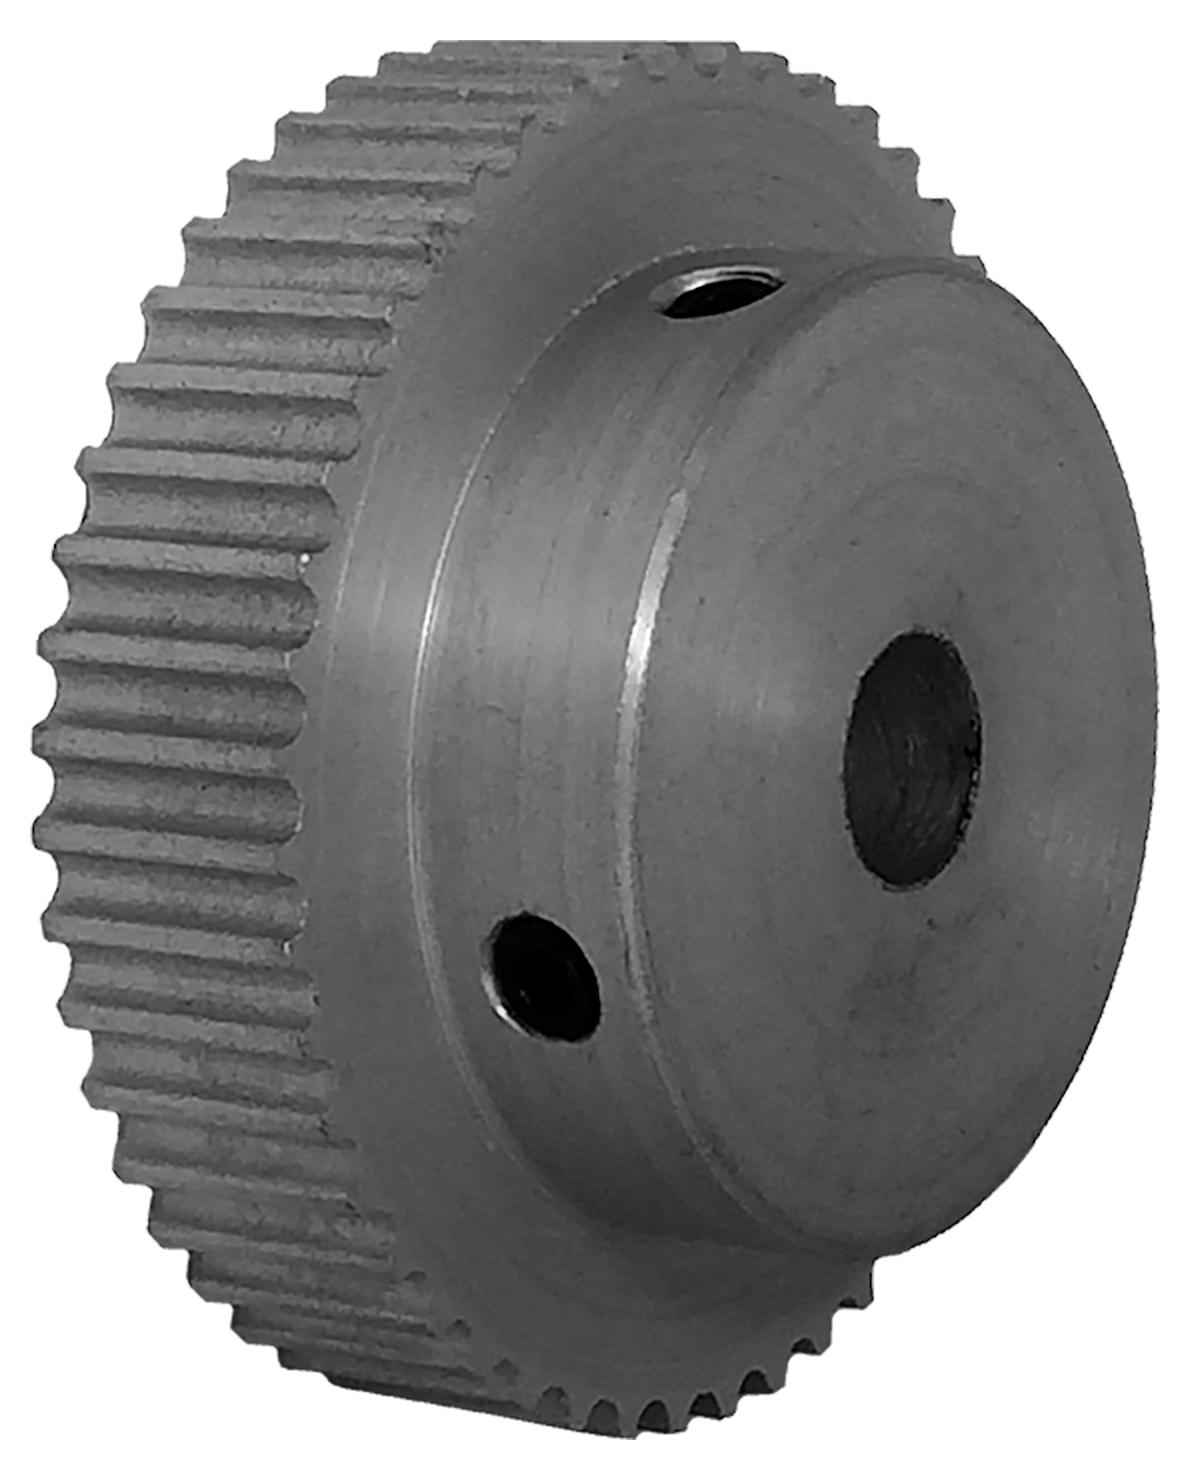 48-3P06-6A4 - Aluminum Powerhouse® Pulleys